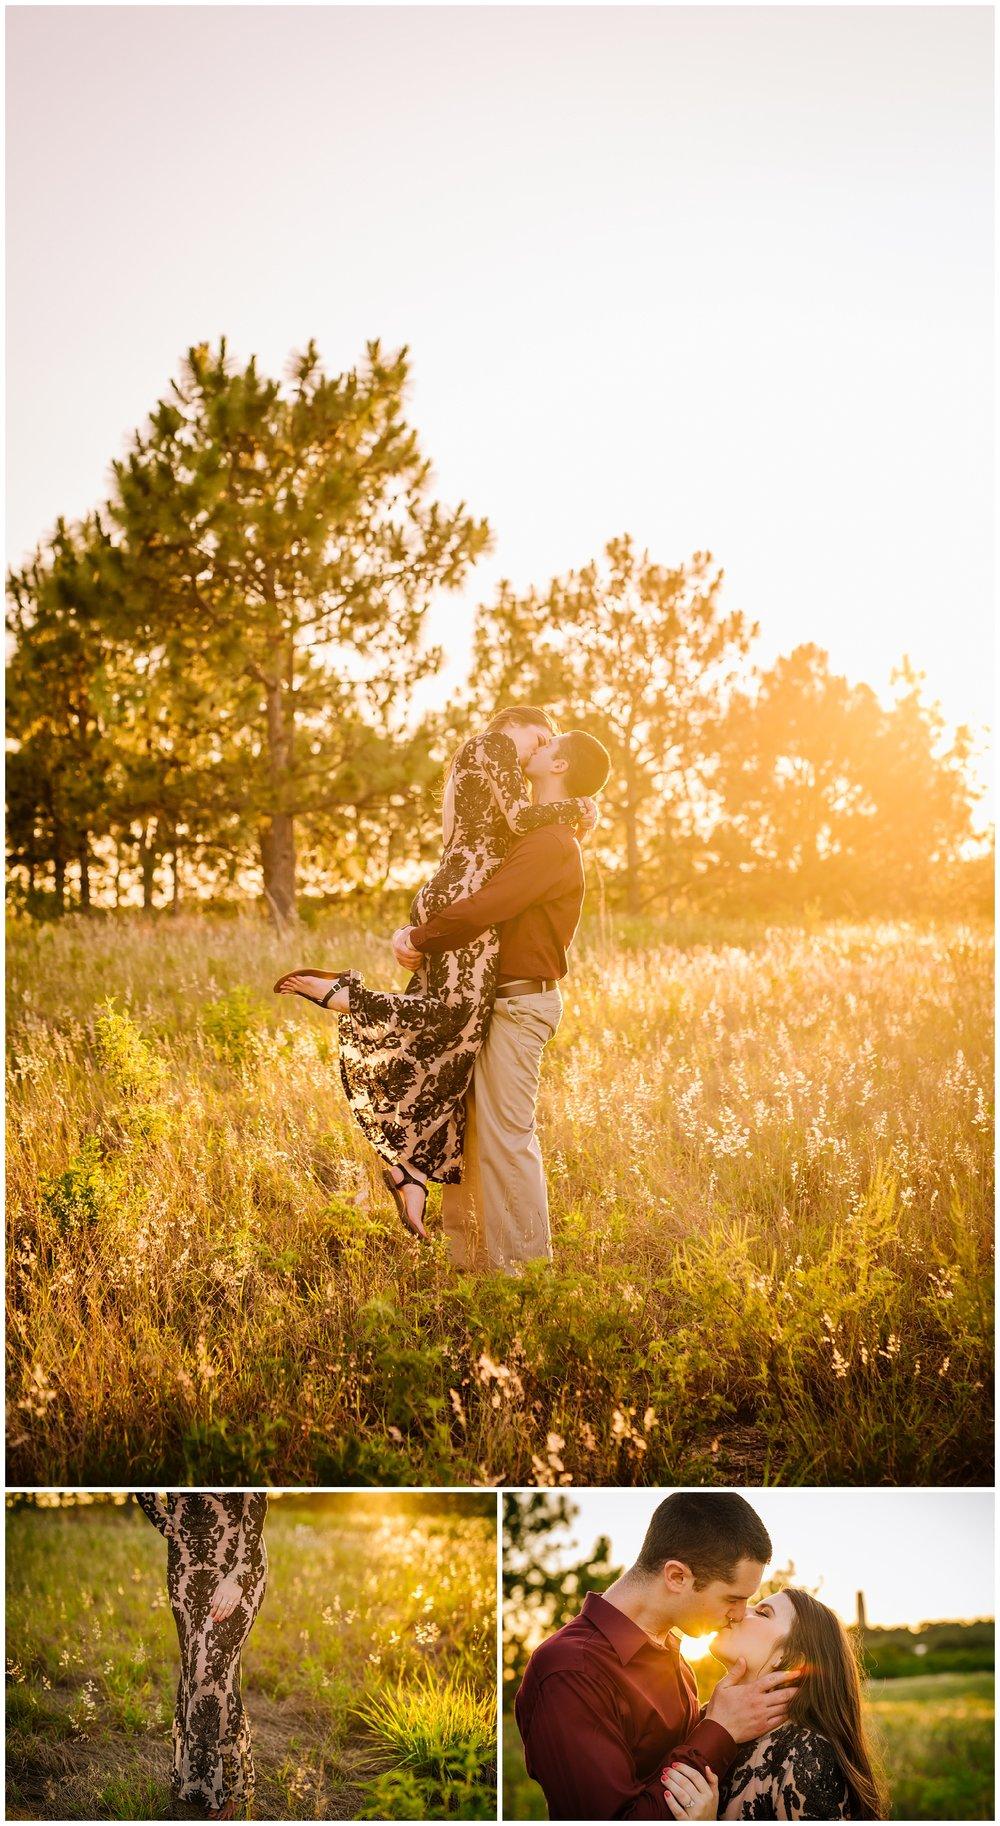 Ashlee-hamon-photography-year-in-review-2016-travel-wanderlust-vsco-adventure-wedding_0134.jpg